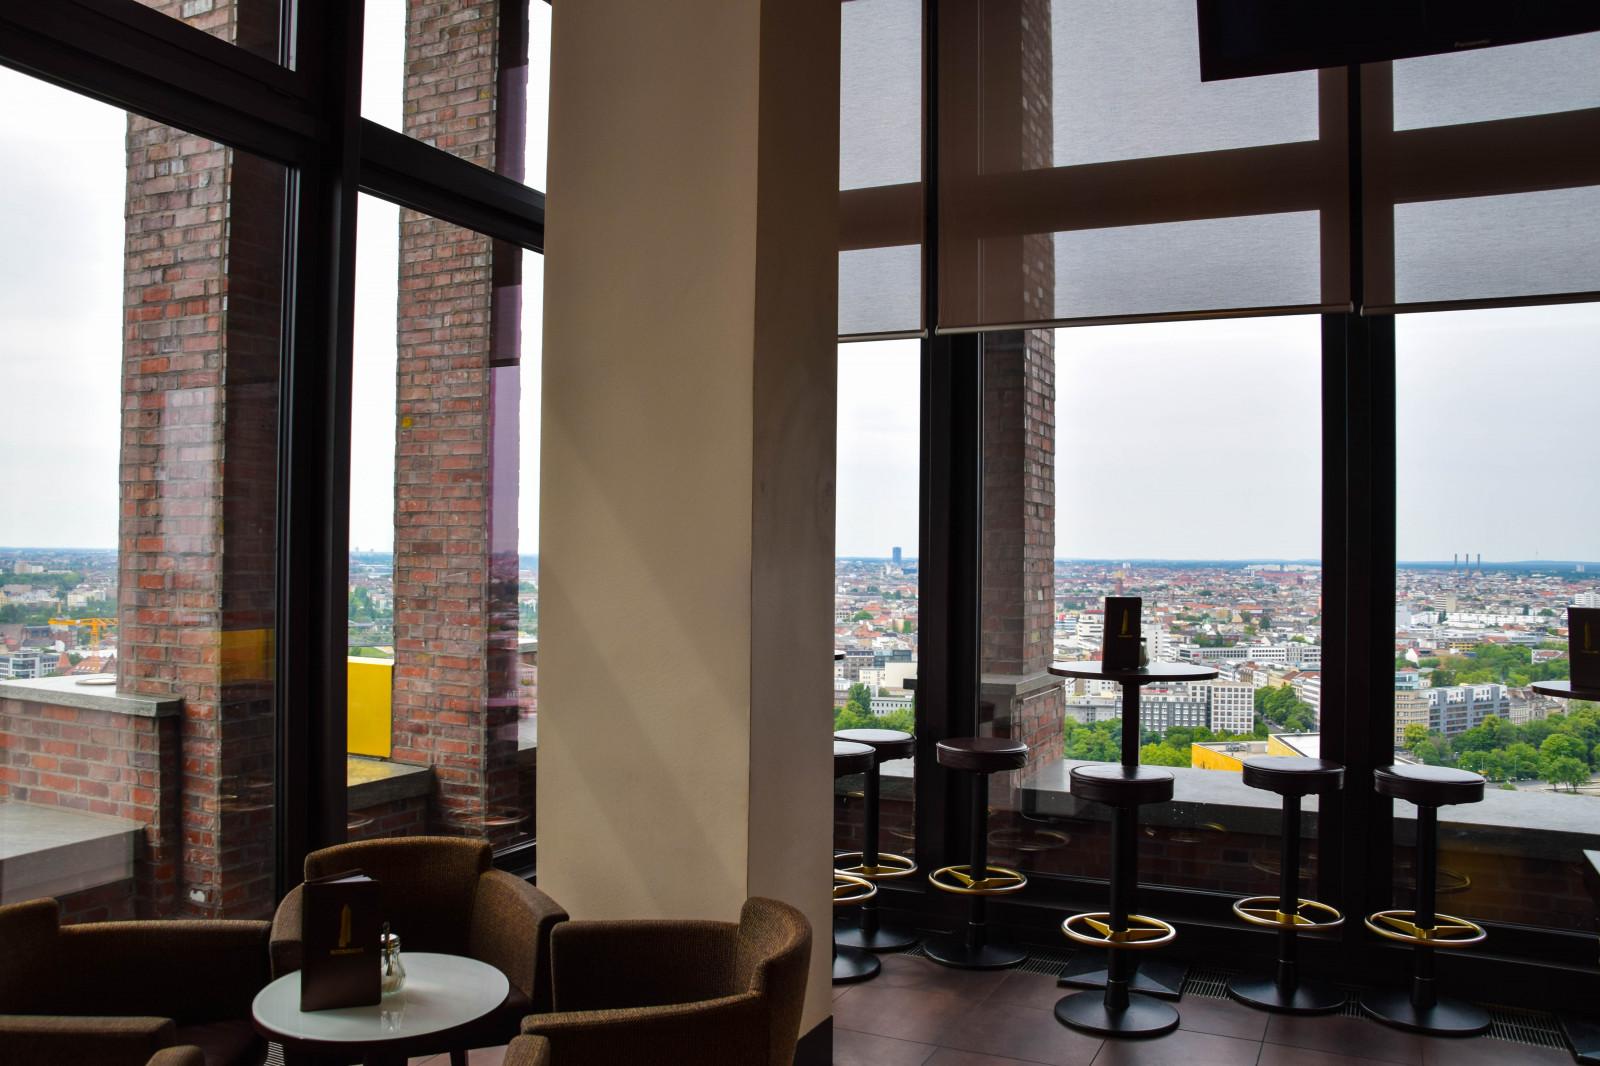 fond d 39 cran ville architecture chambre bois allemagne verre bar restaurant design d. Black Bedroom Furniture Sets. Home Design Ideas